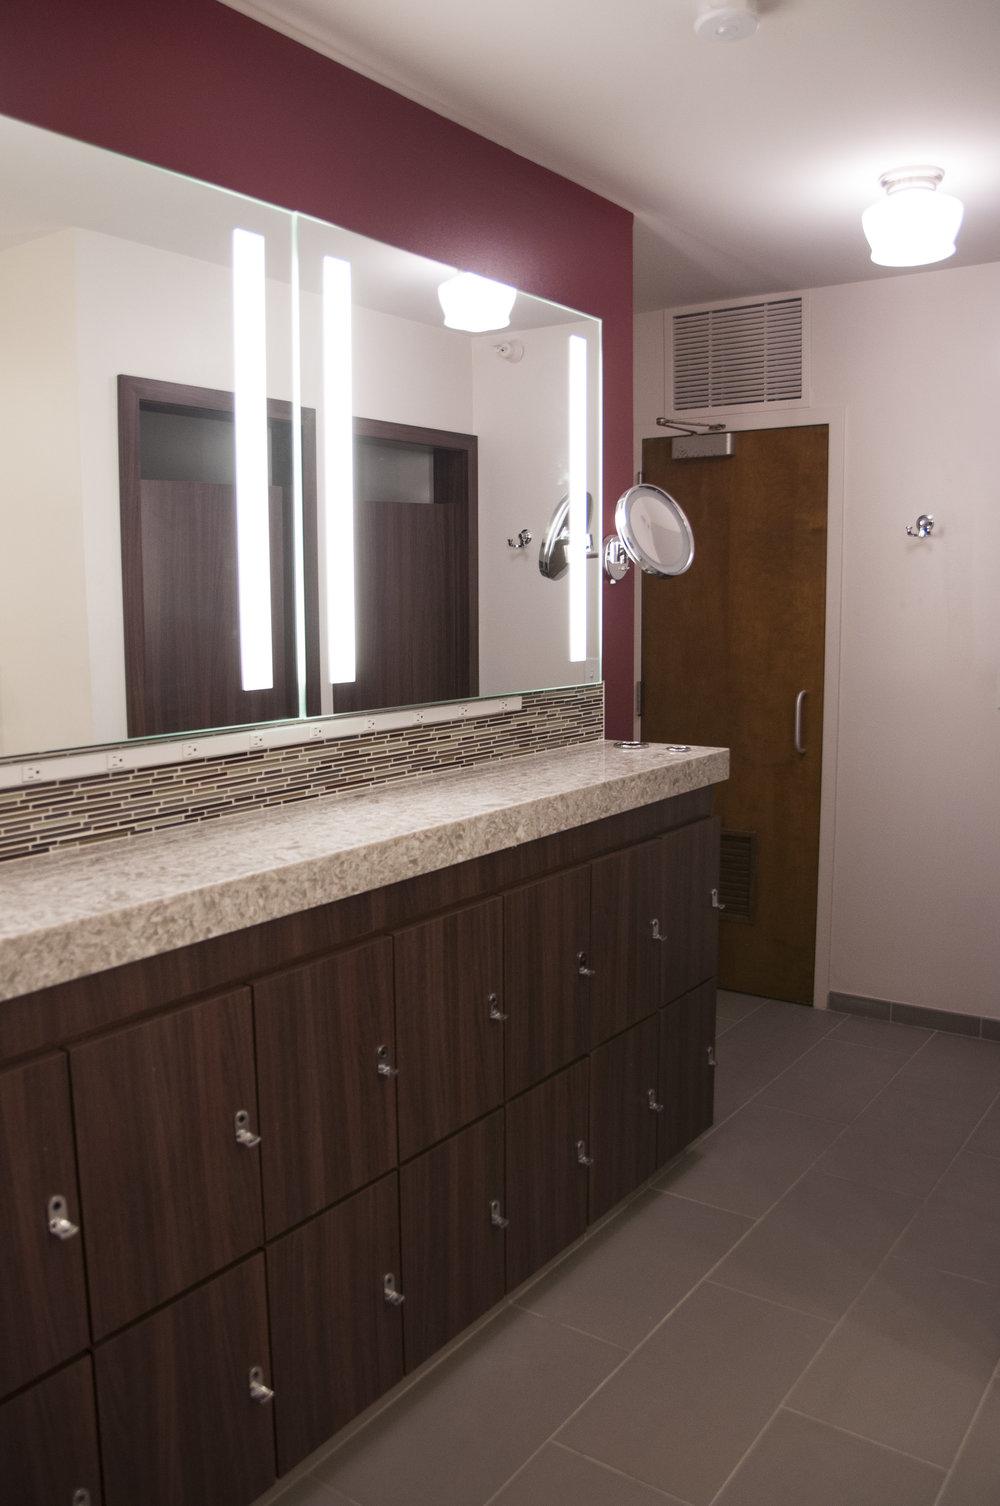 Interiors_AlphaPhi_Bathroom-23.jpg